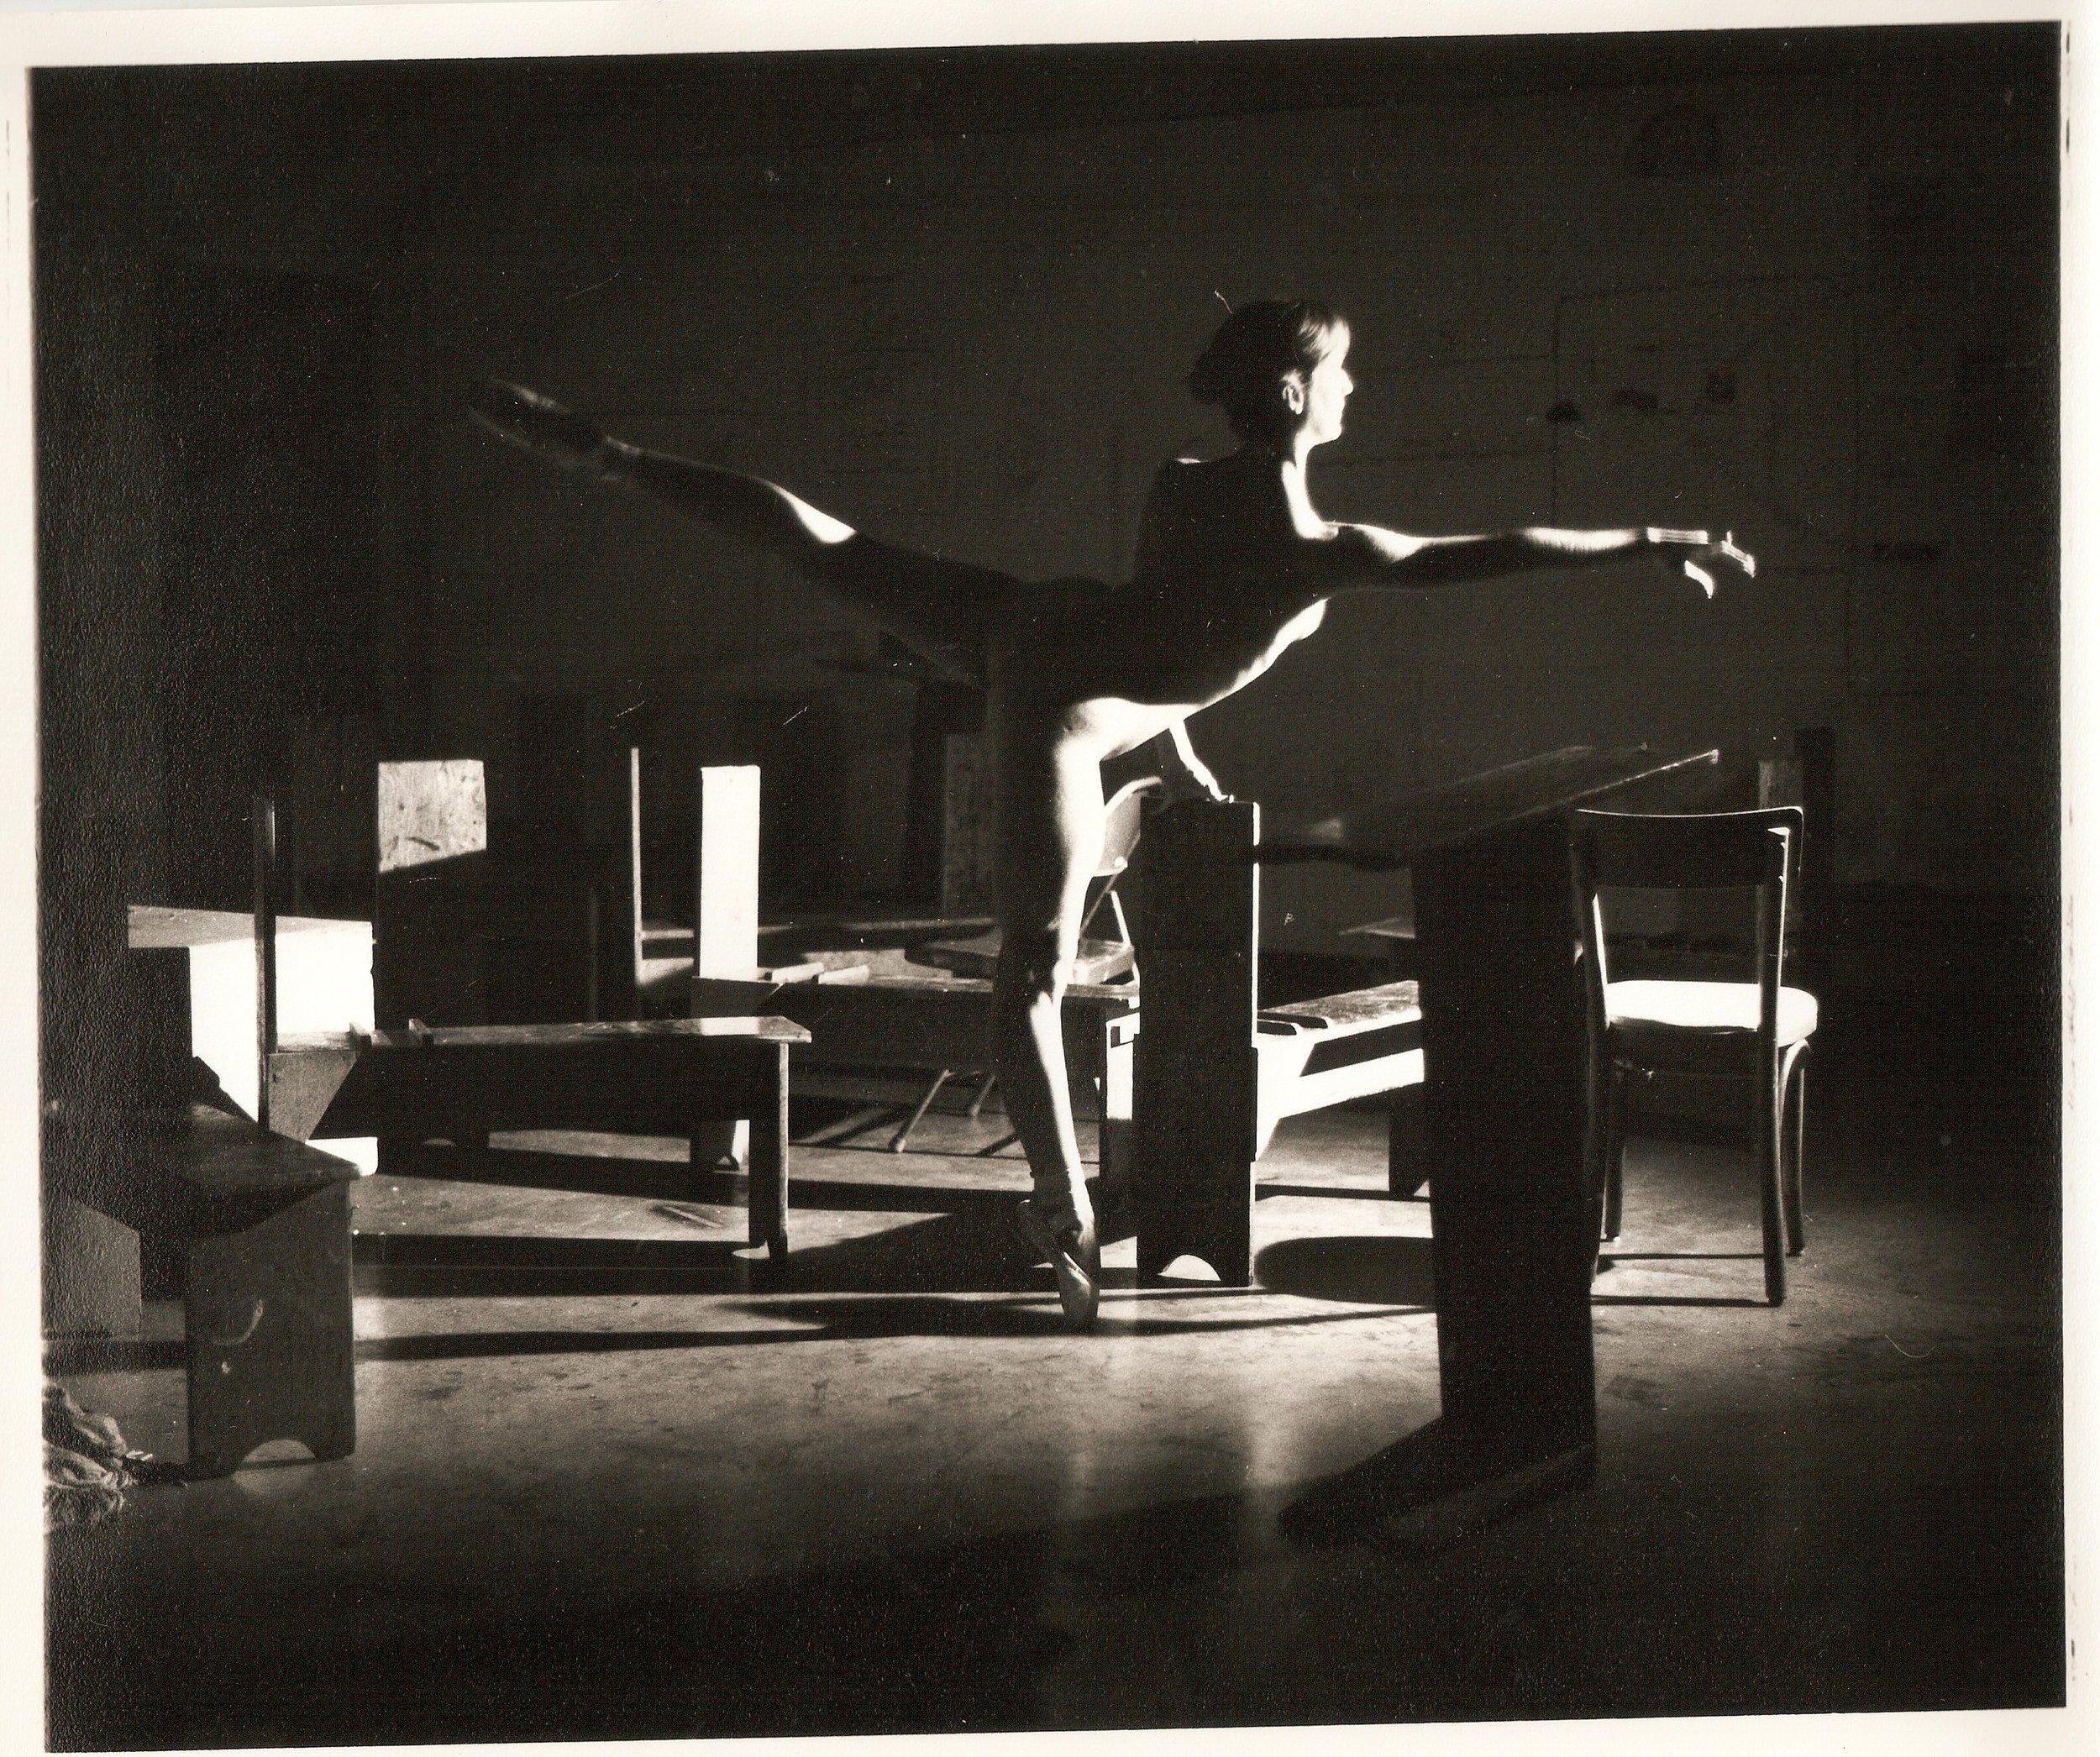 Loren Ellis Ballet  in Fla. Painting Studio 1 of 3 8x10 1979.jpg